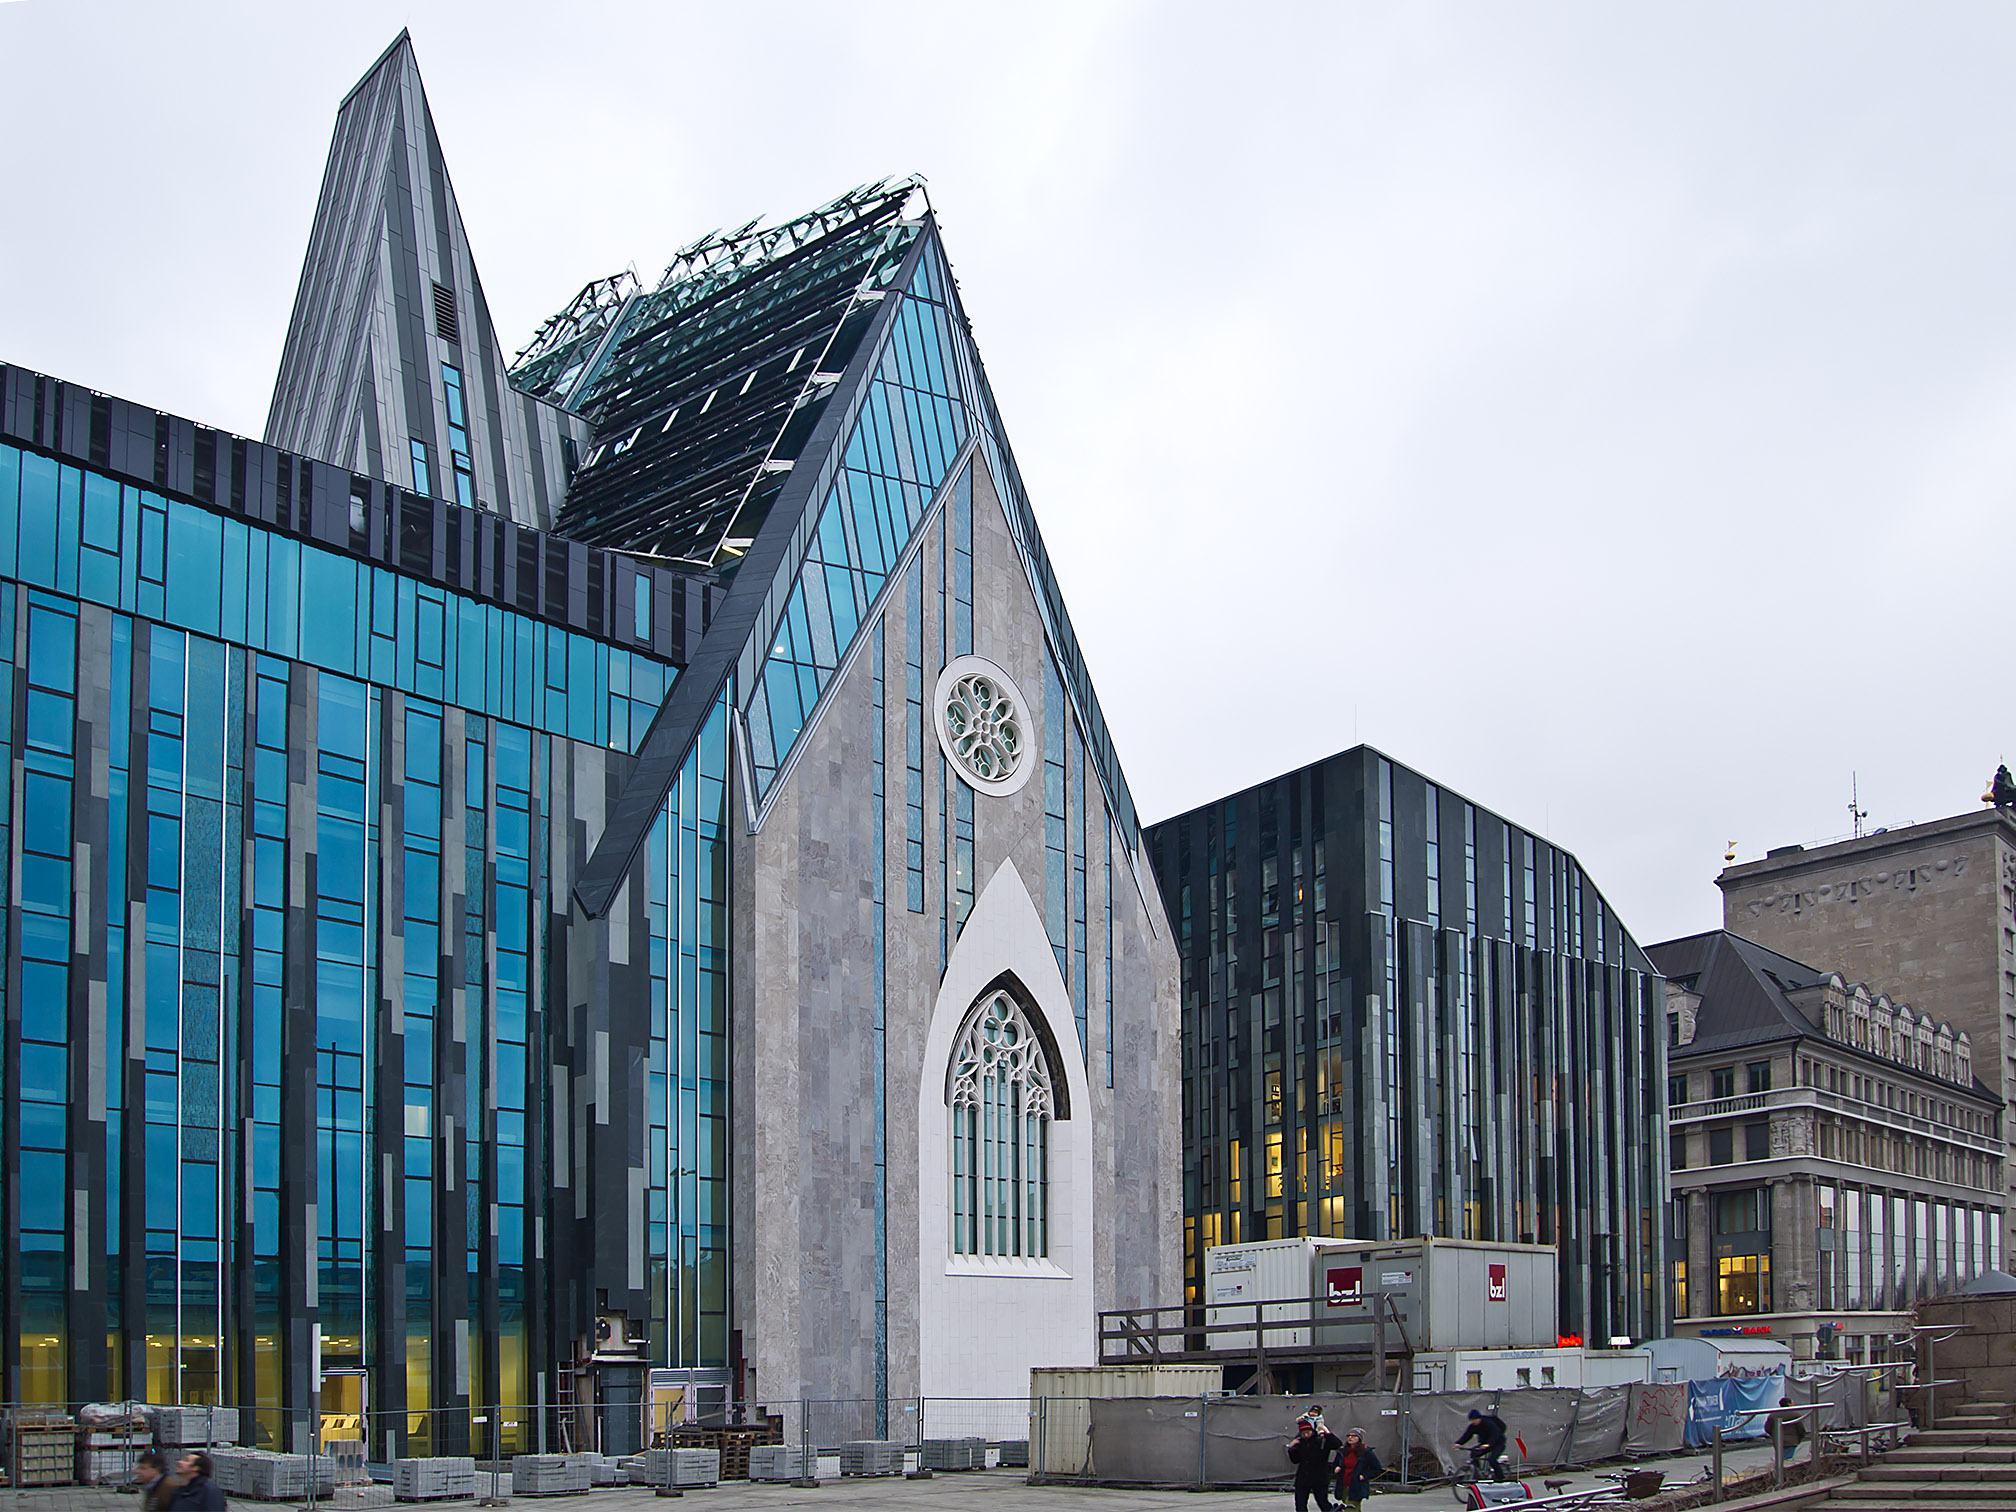 Uni_Leipzig_Paulinum_Universitätskirche_St._Pauli